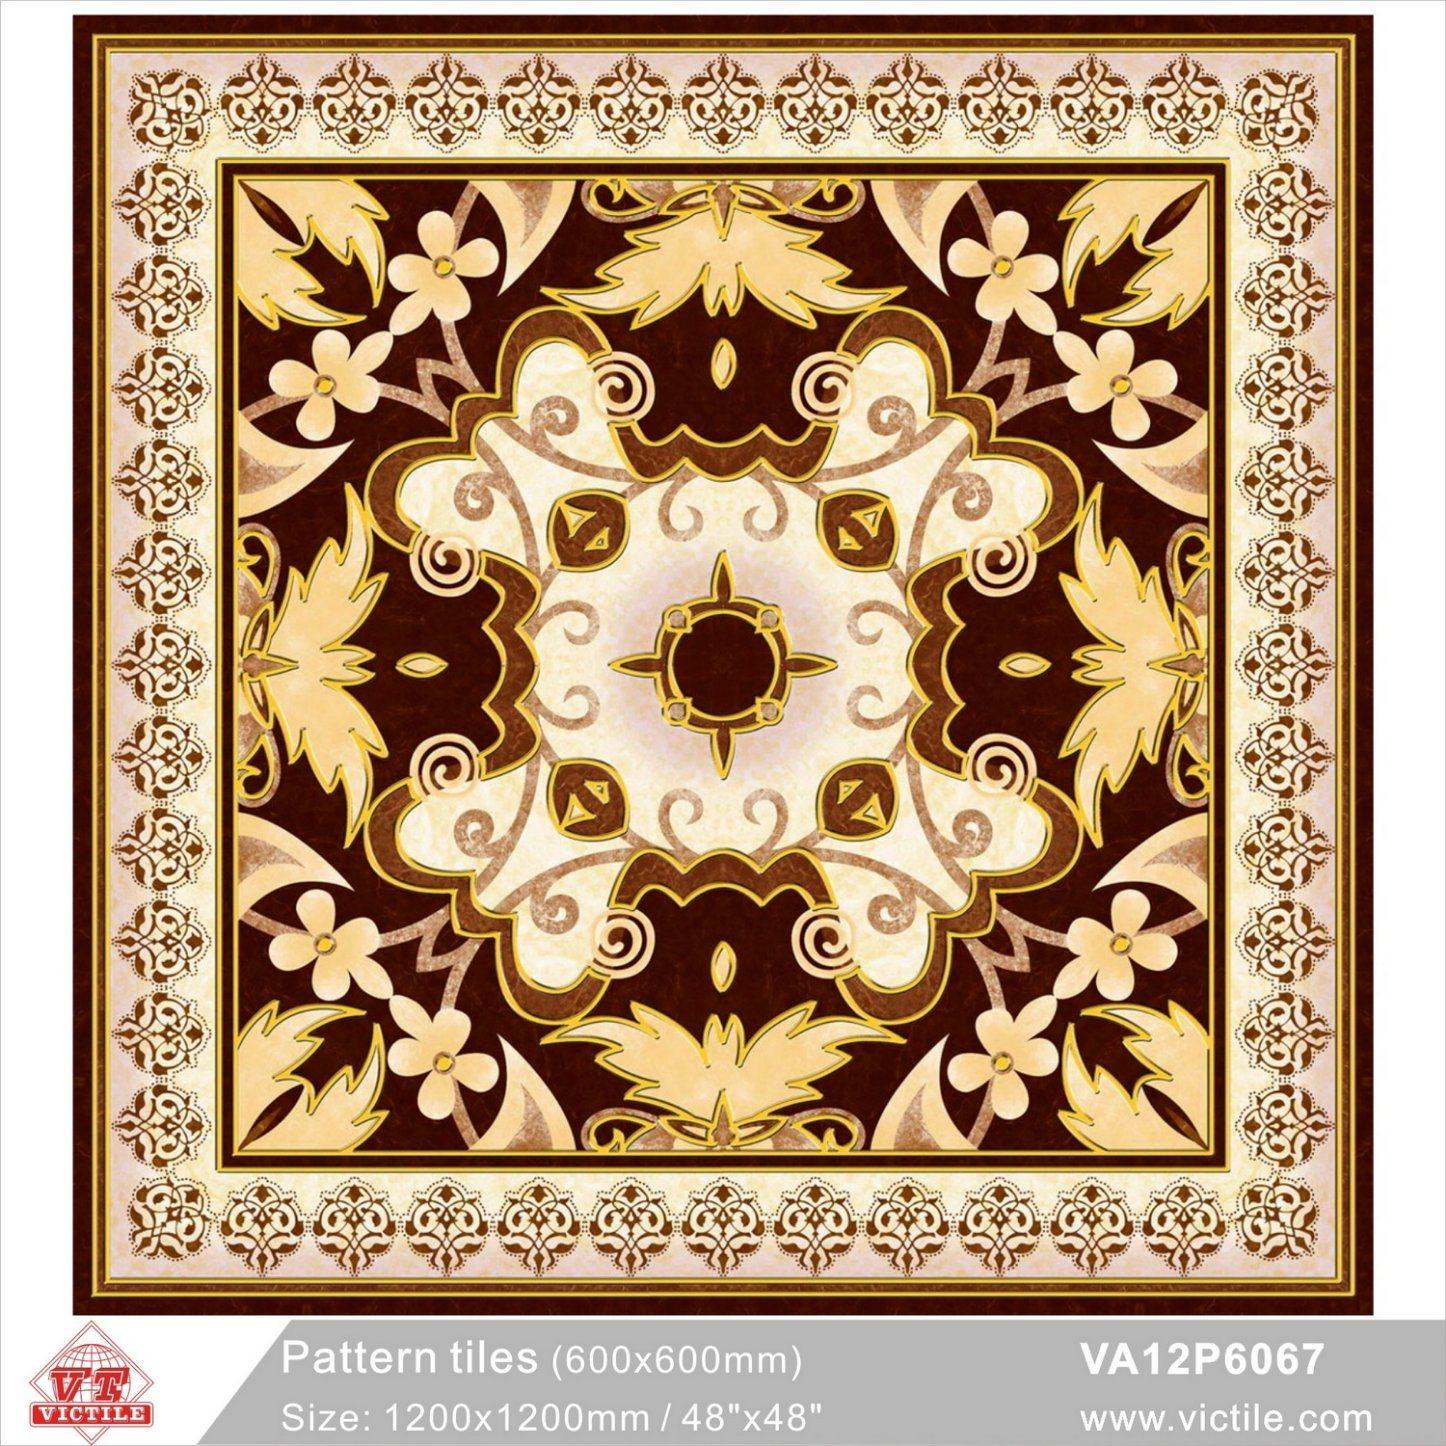 china flower building material puzzle carpet floor tile va12p6067 1200x1200mm 48 x48 china tile floor tile